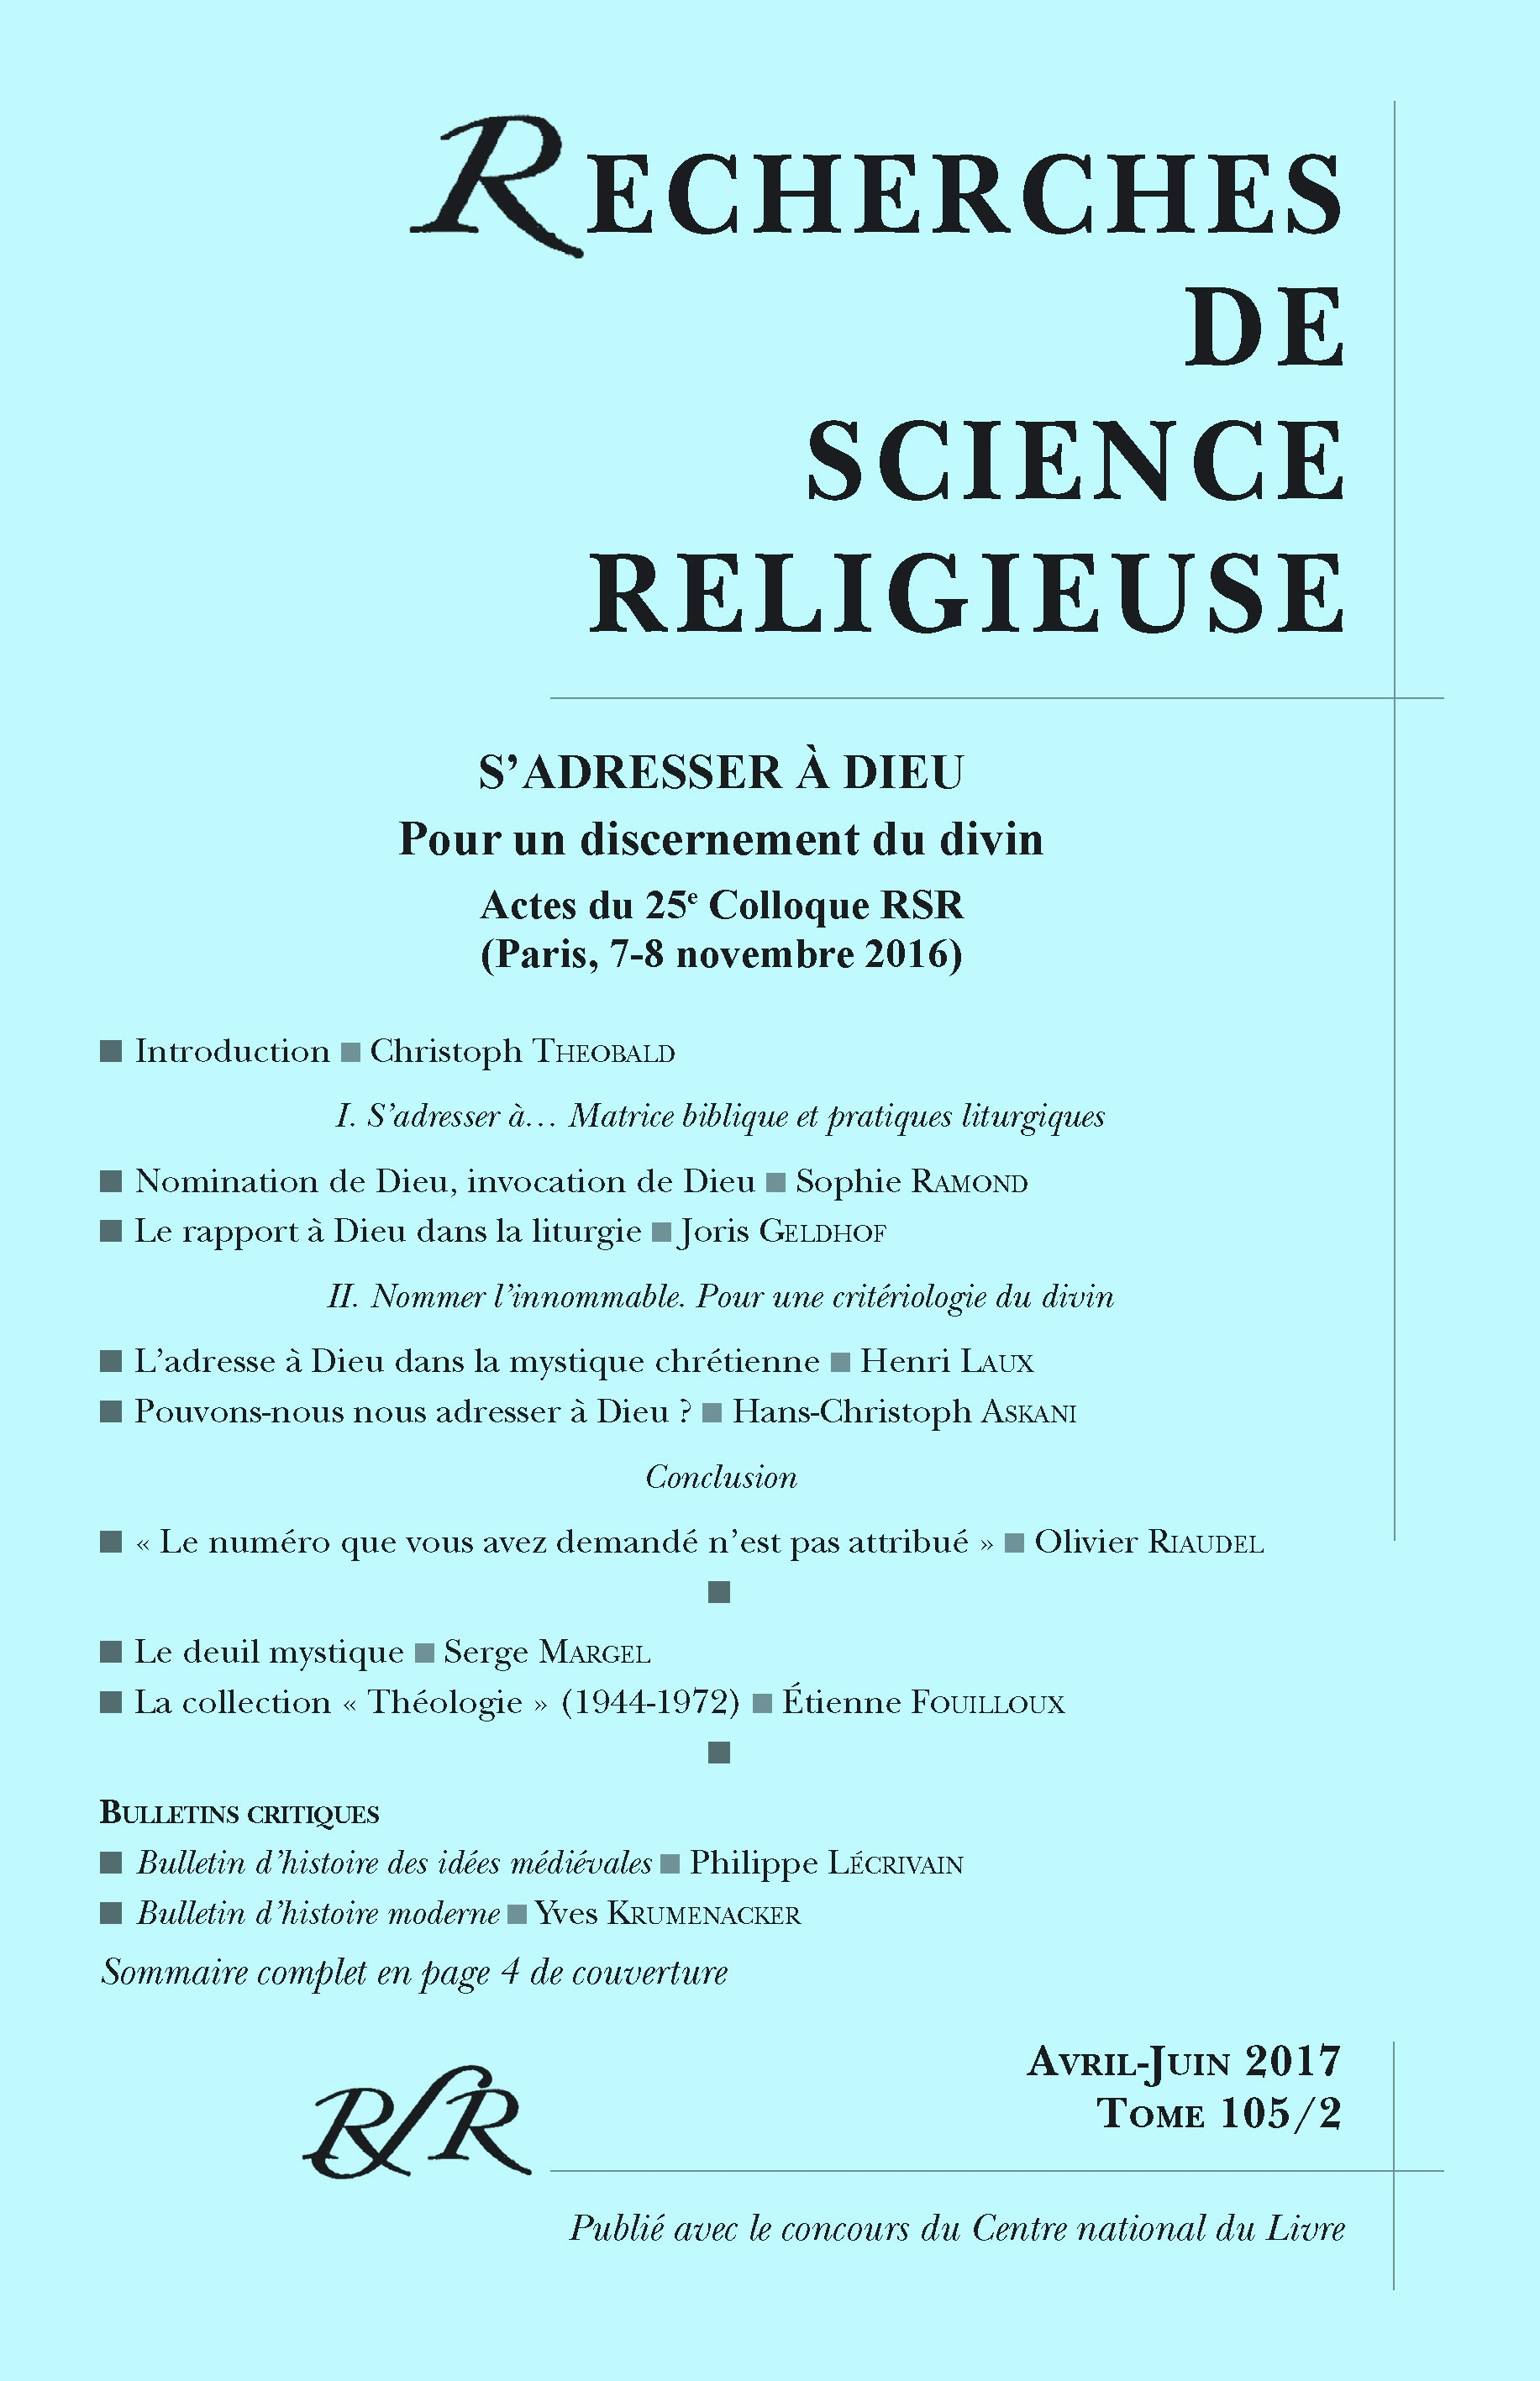 Bulletin D Histoire Des Idees Medievales Cairn Info